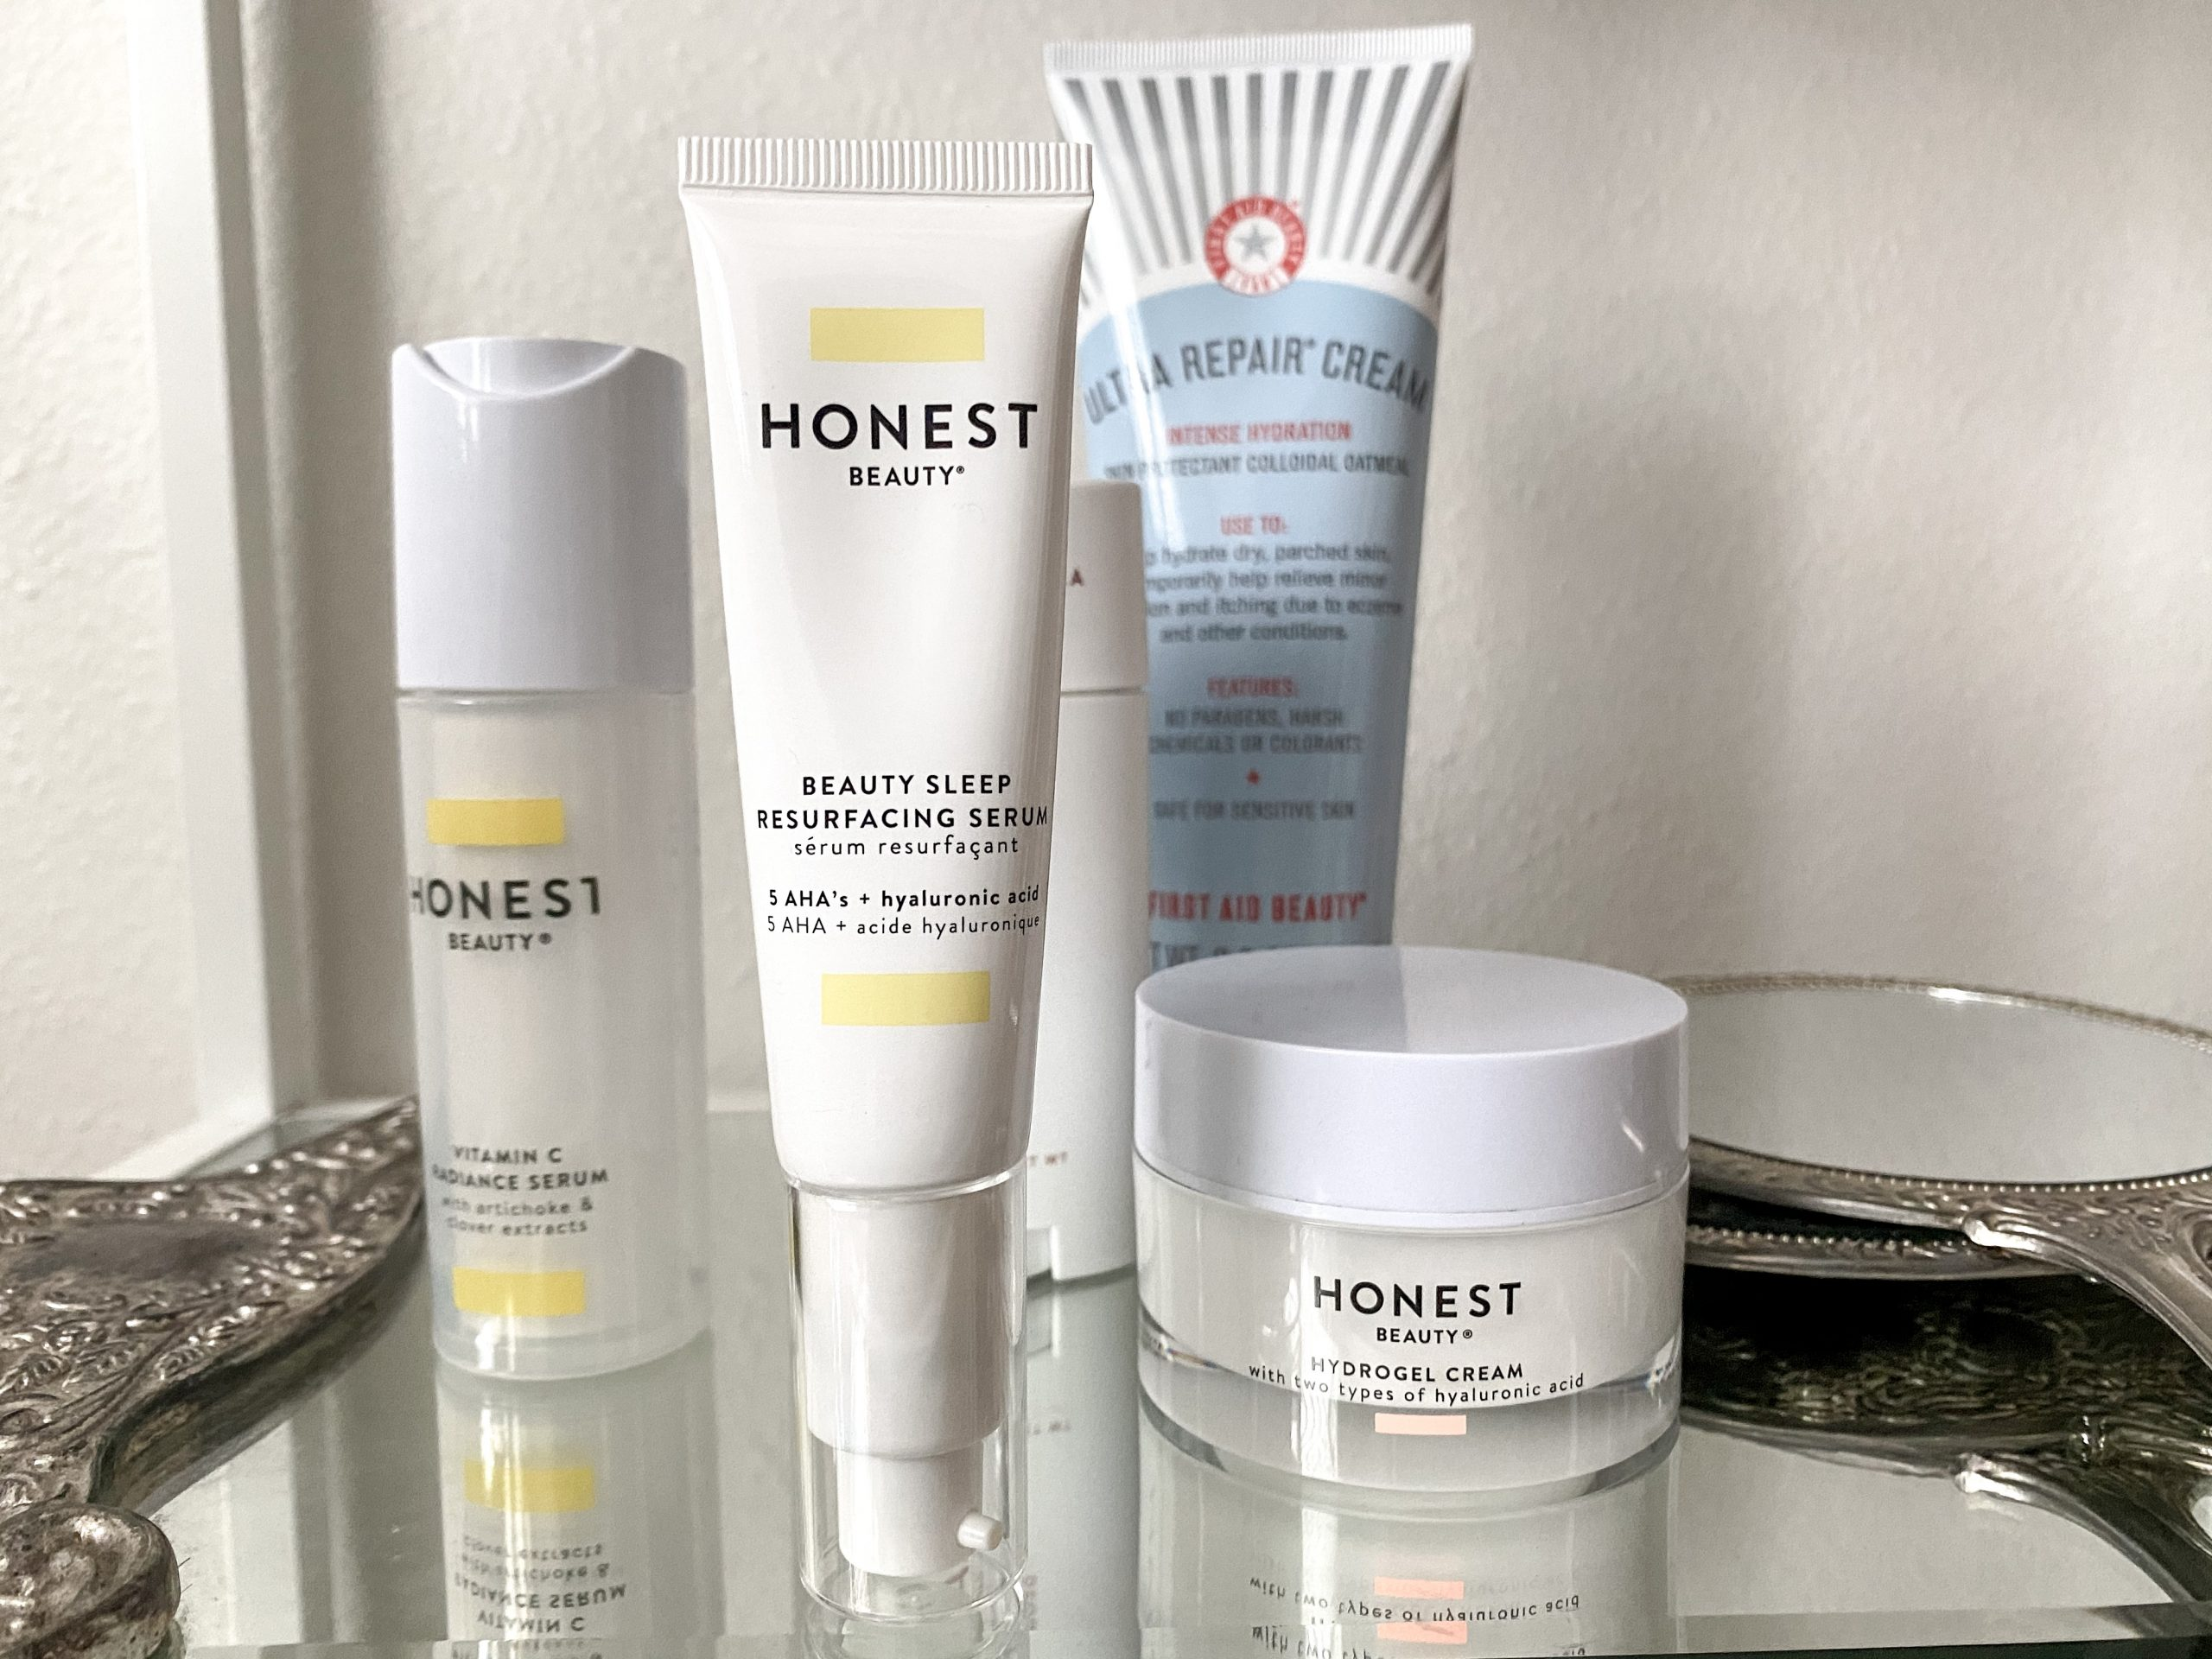 Honest Beauty Sleep Resurfacing Serum